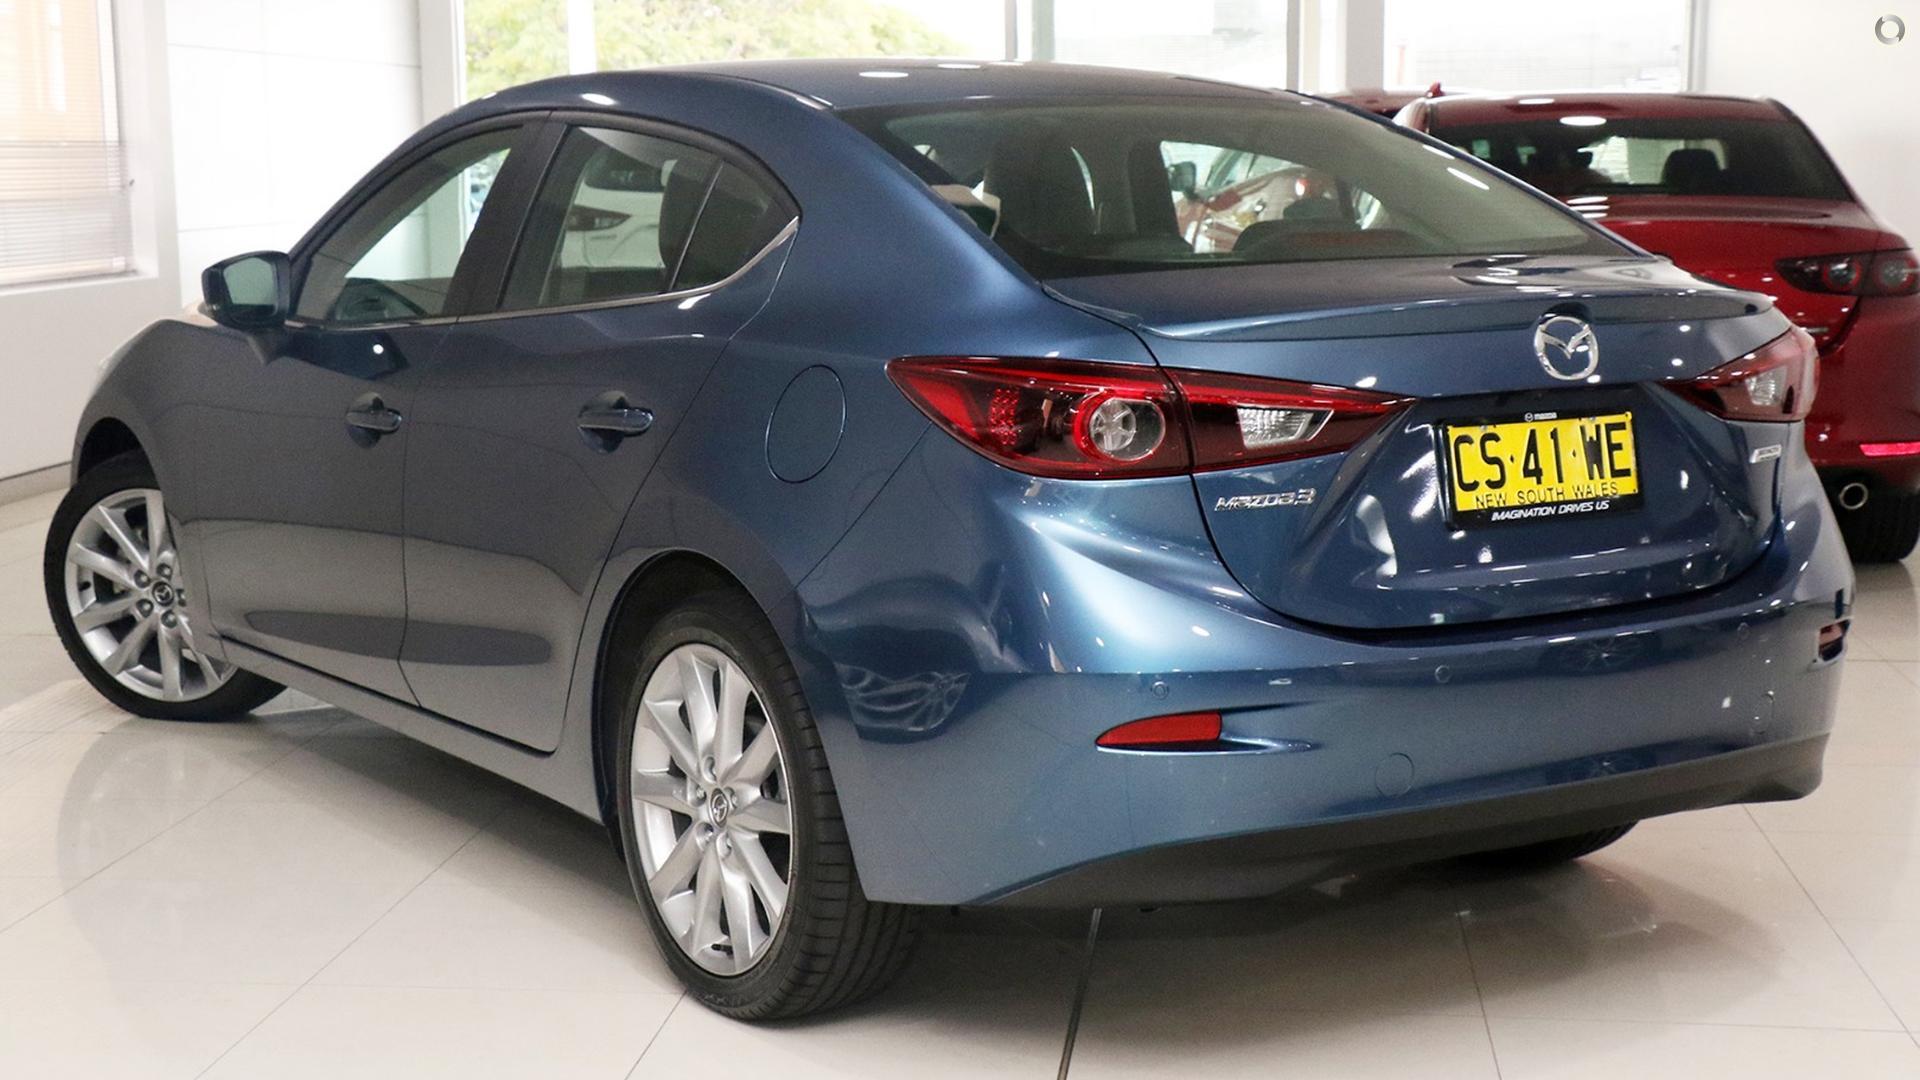 Used cars - Artarmon Mazda